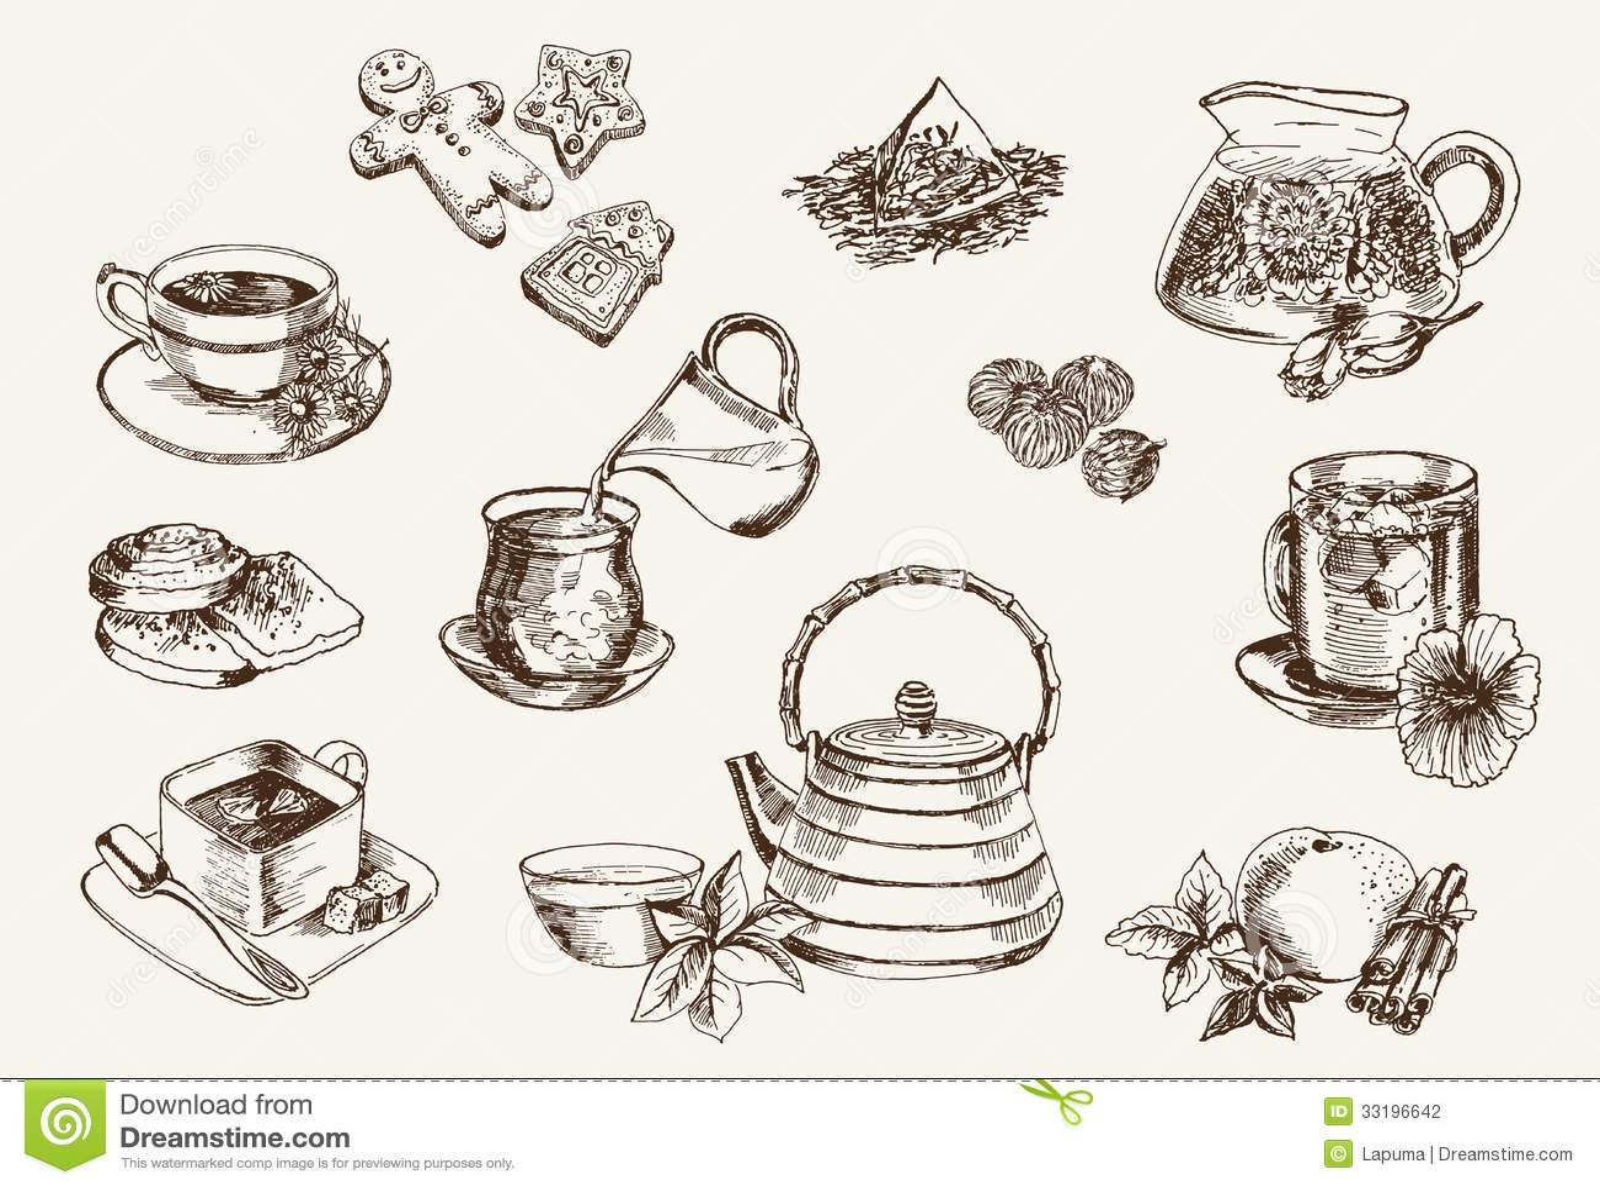 Some types of tea